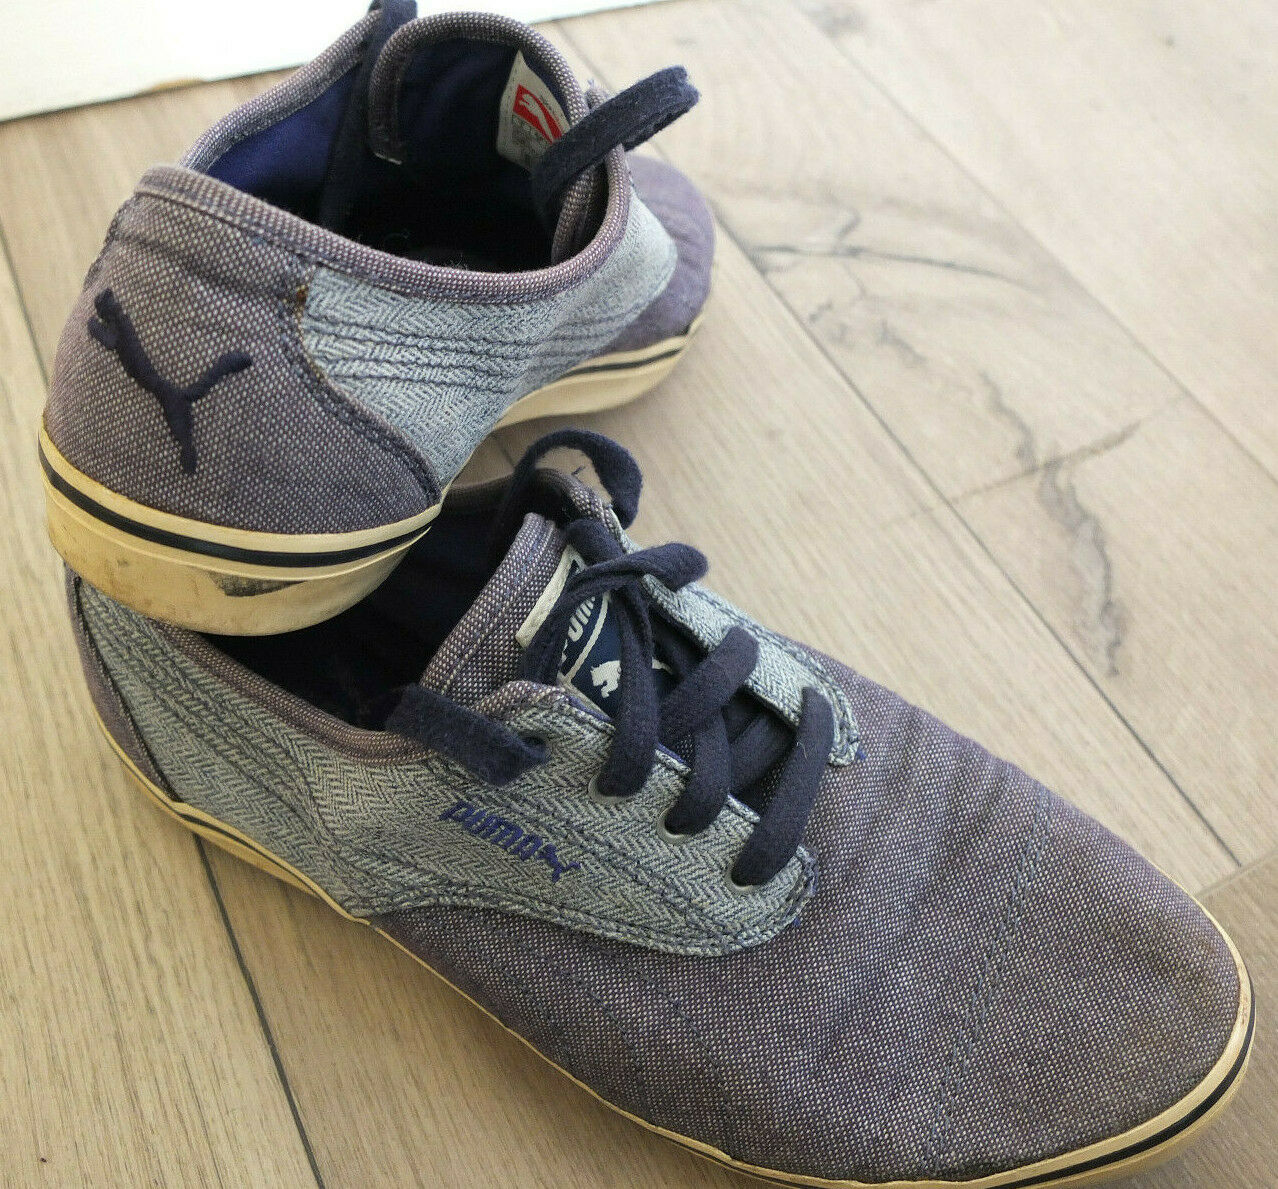 PUMA Chaussures Baskets Gr. 37 Royaume-Uni 4